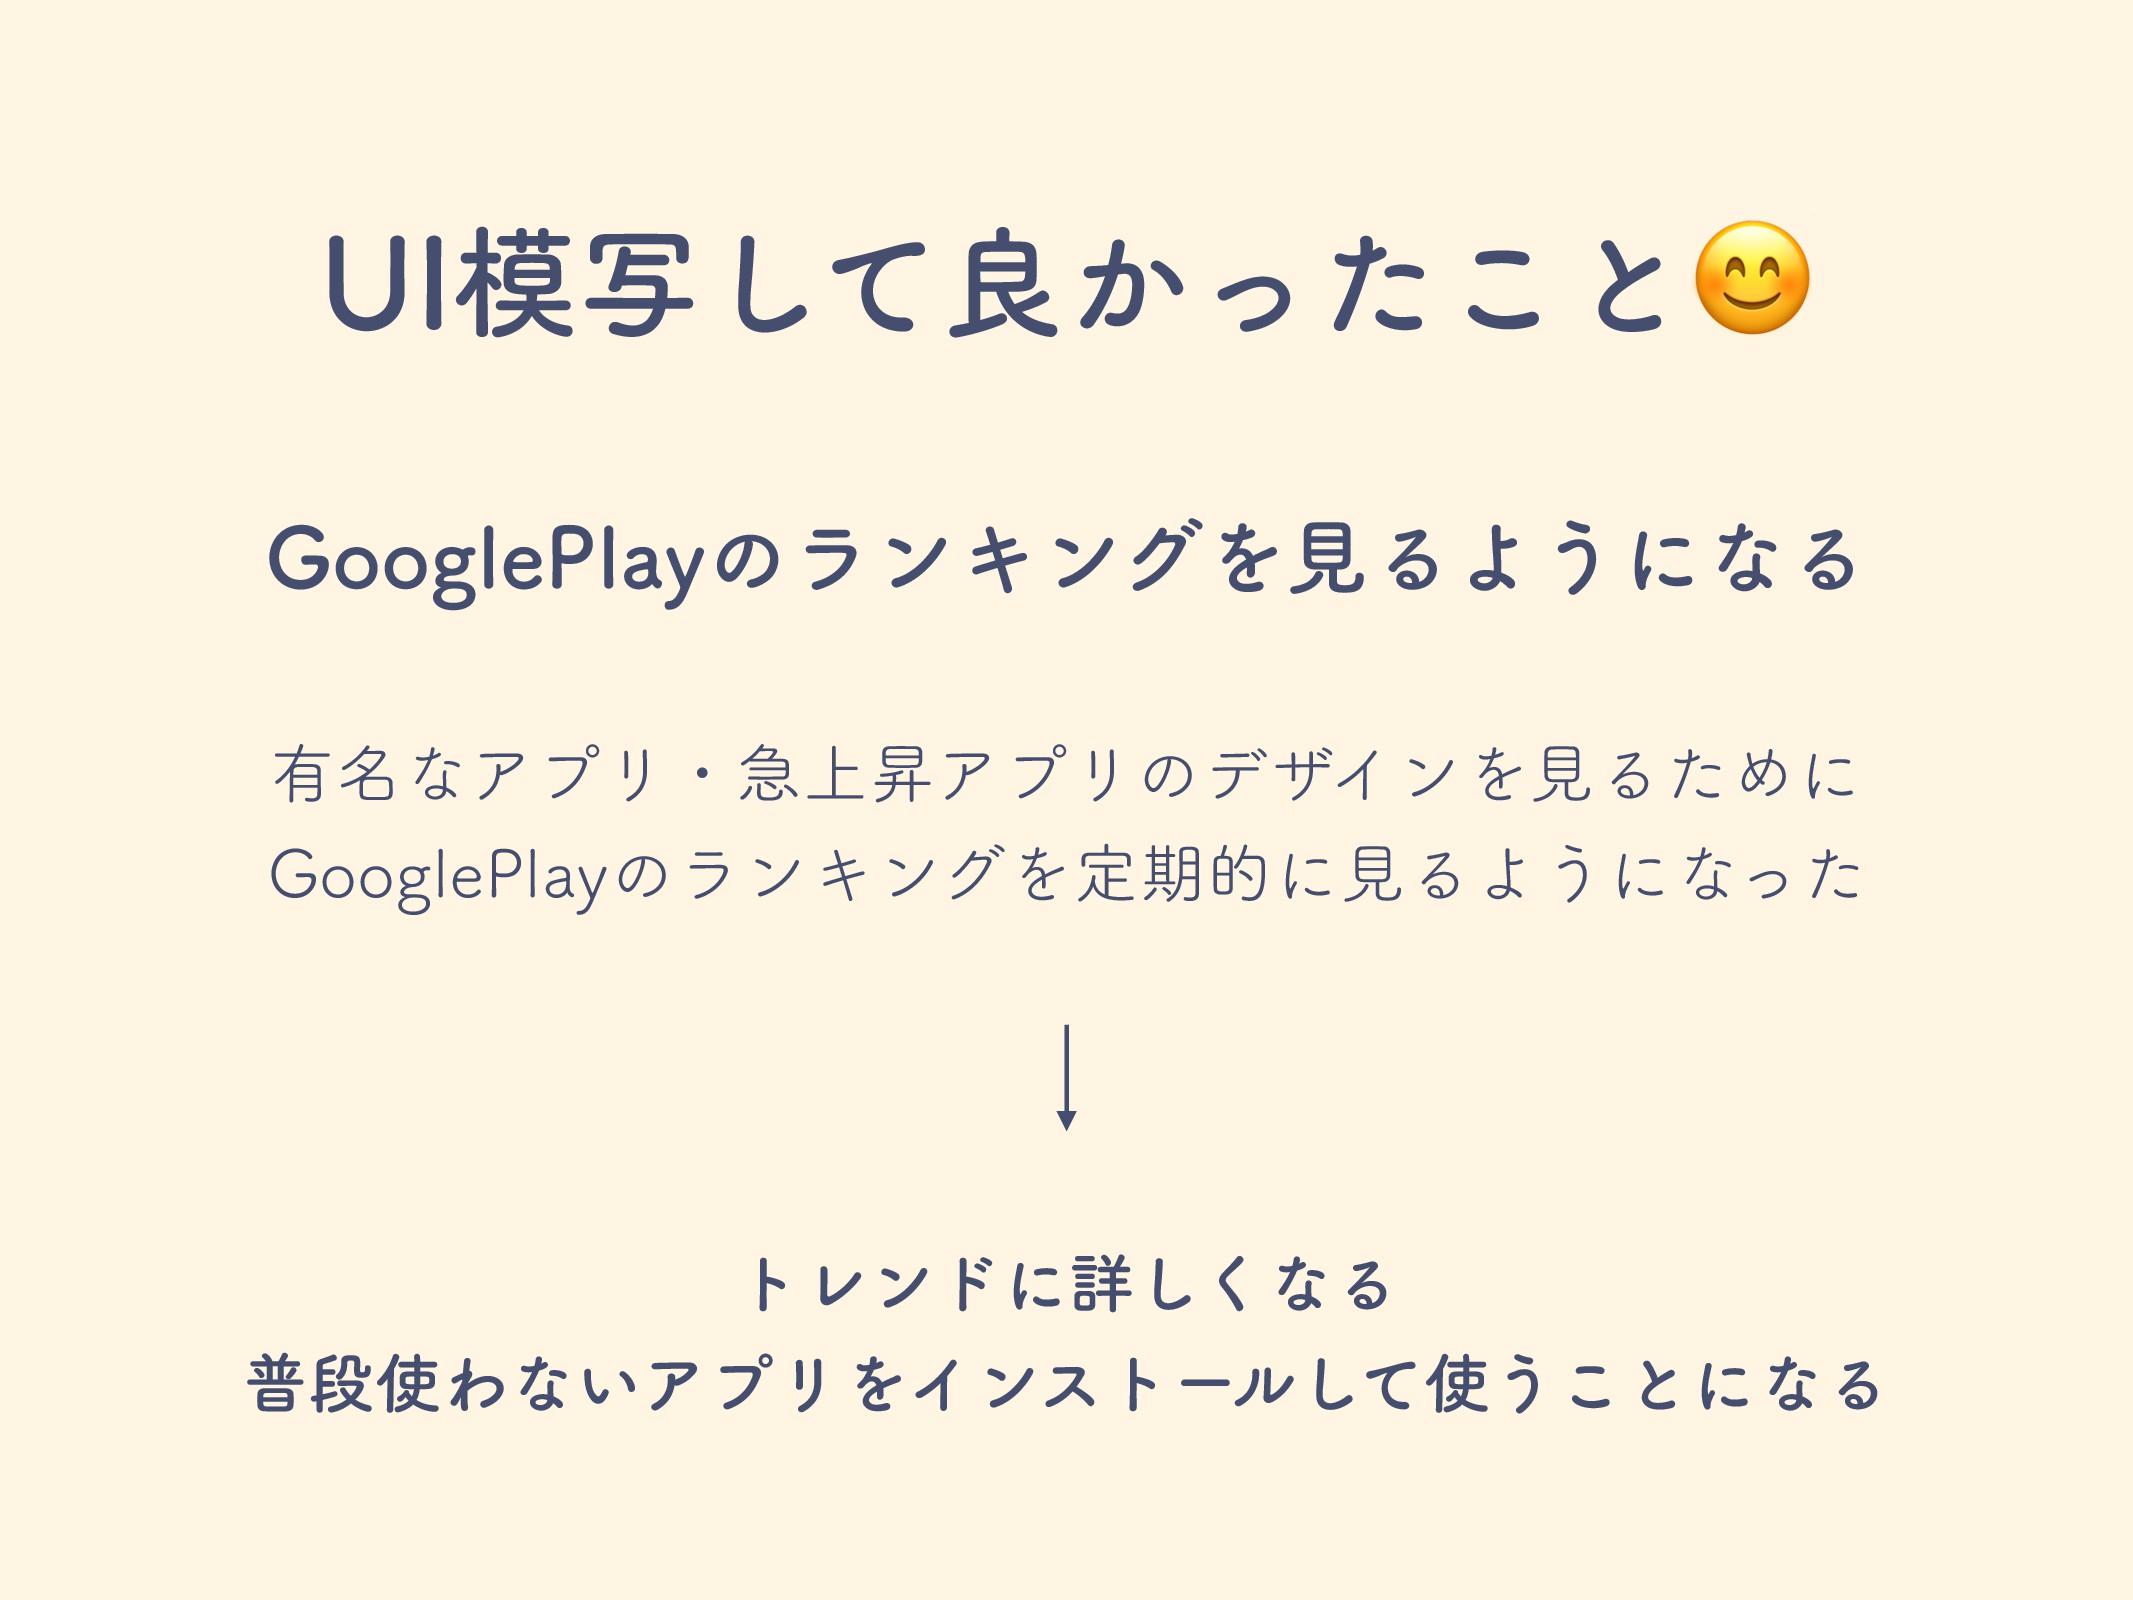 6*ࣸͯ͠ྑ͔ͬͨ͜ͱ ༗໊ͳΞϓϦɾٸ্ঢΞϓϦͷσβΠϯΛݟΔͨΊʹ (PPHMF1M...